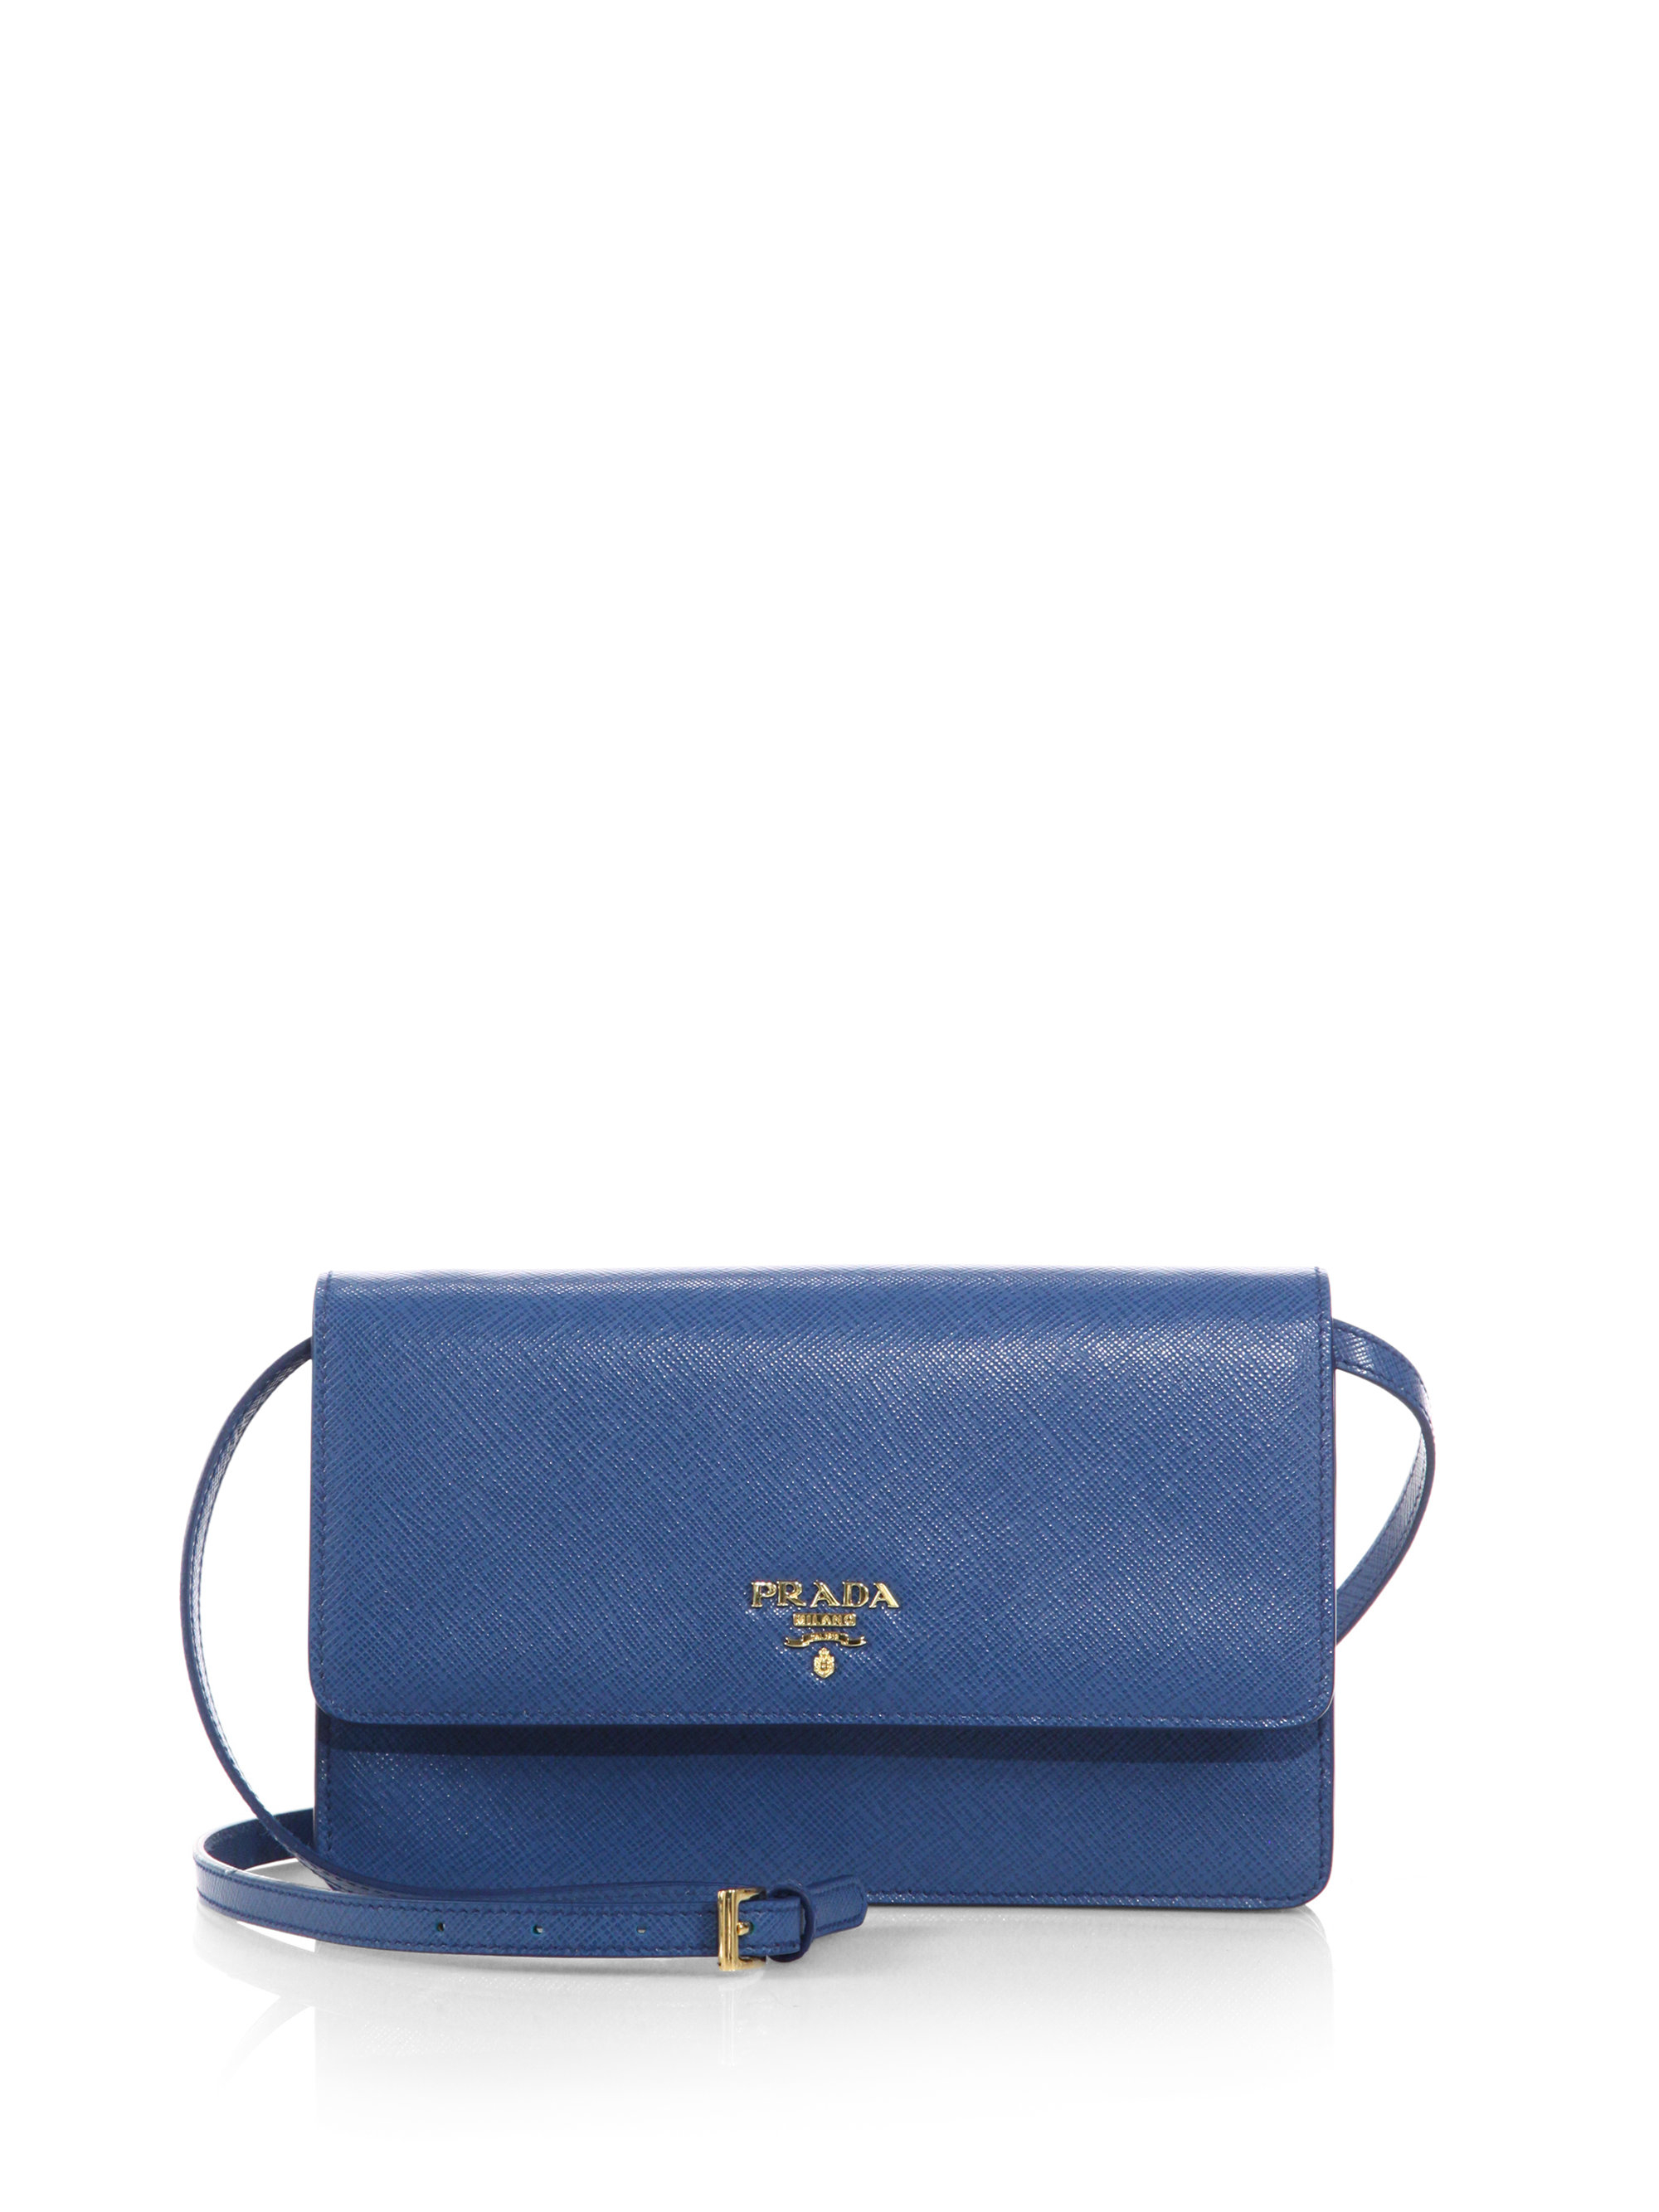 a139c6d9ec42 Prada Saffiano Lux Crossbody Bag in Blue - Lyst